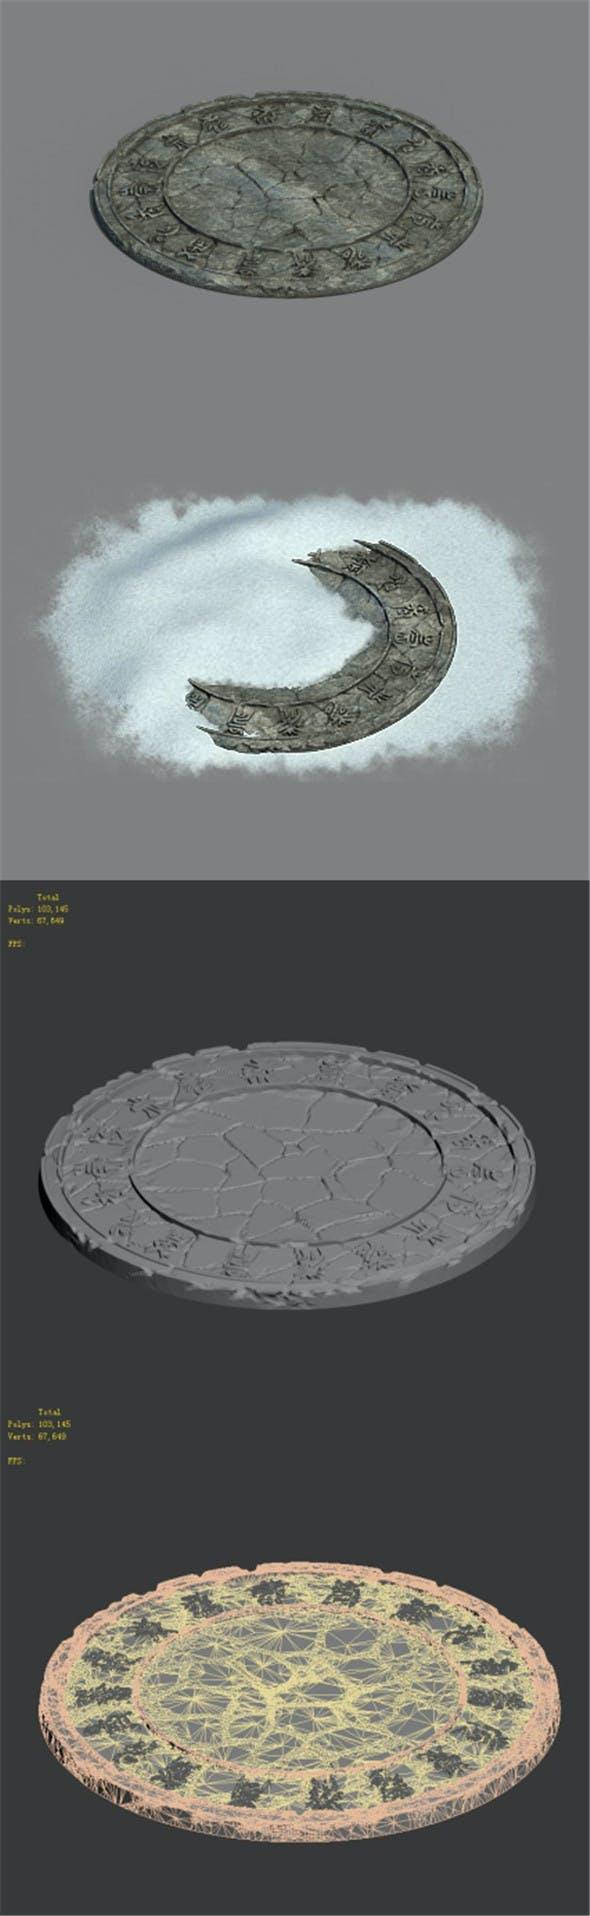 Zhaoshan - relics disc pattern - 3DOcean Item for Sale